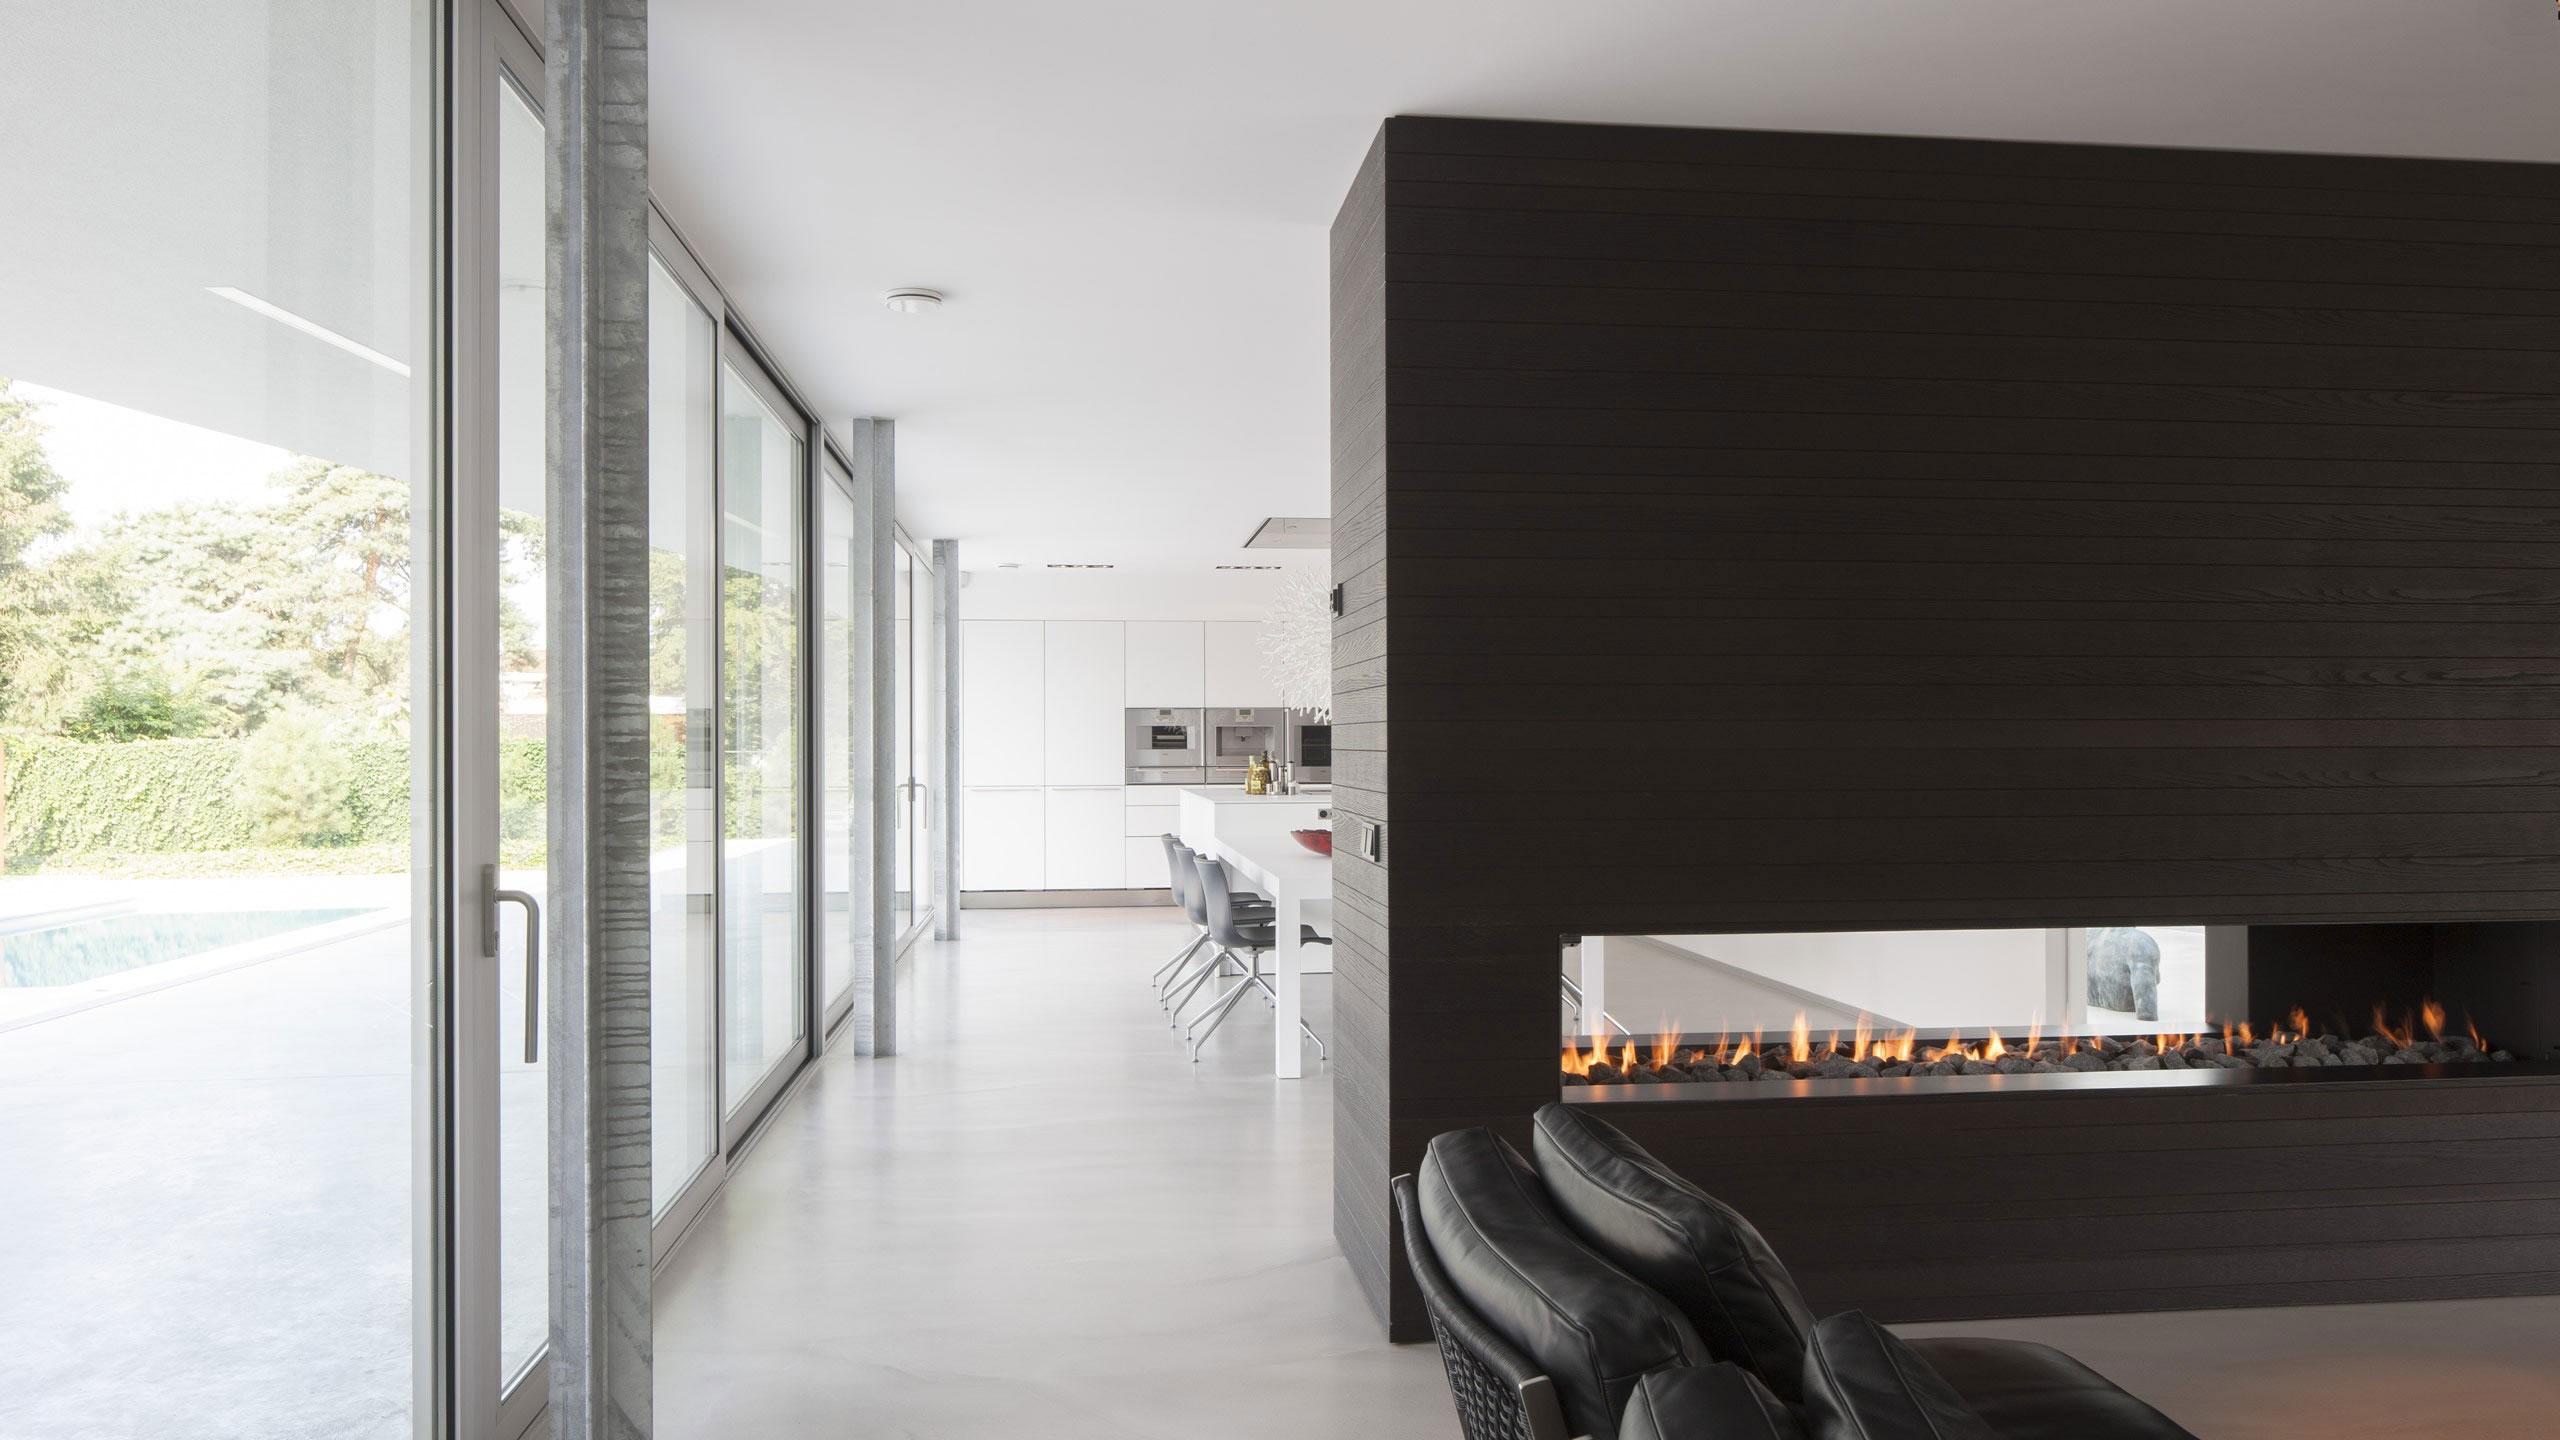 Boxed Villa Spee Haelen with Panoramic Windows by Lab32 architecten-18